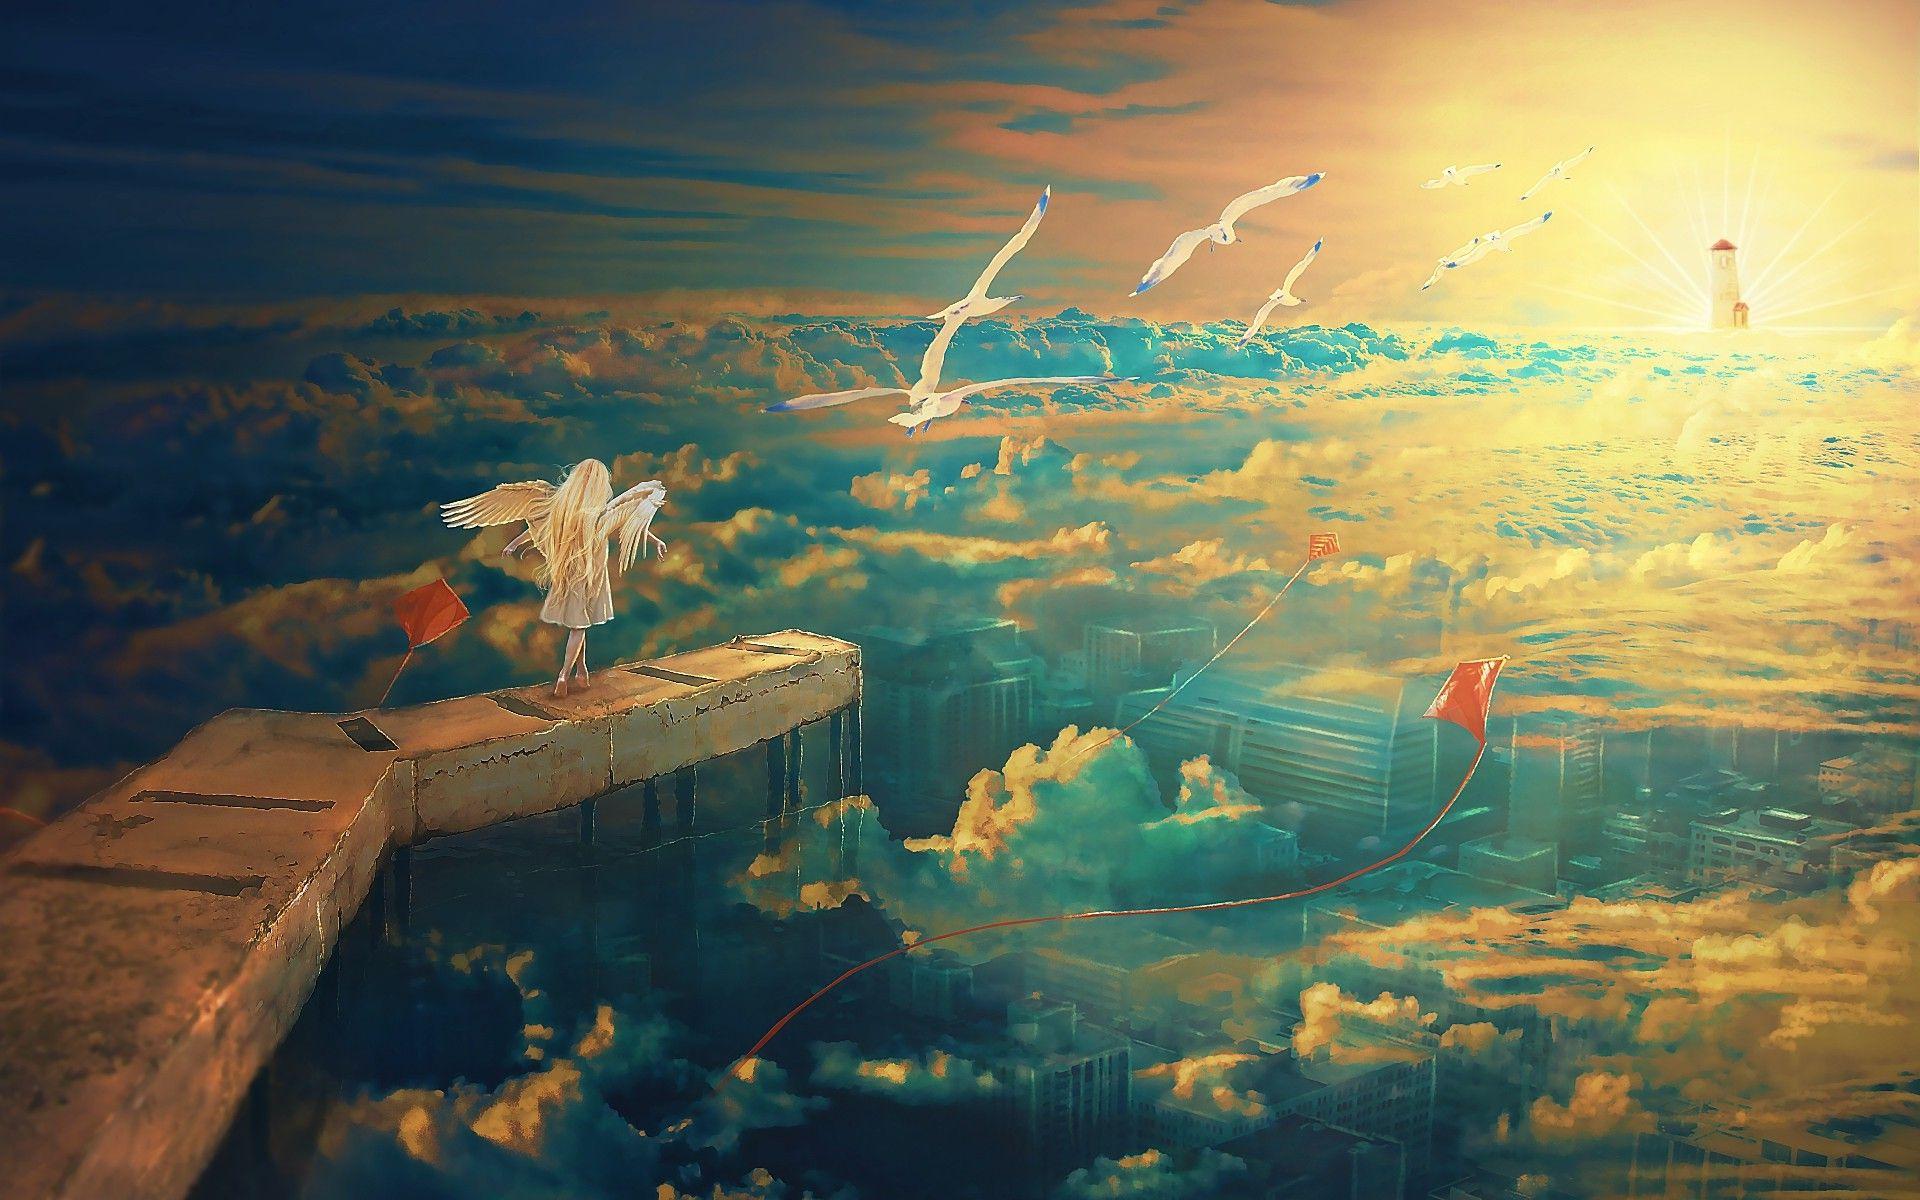 Anime Sunset Scenery